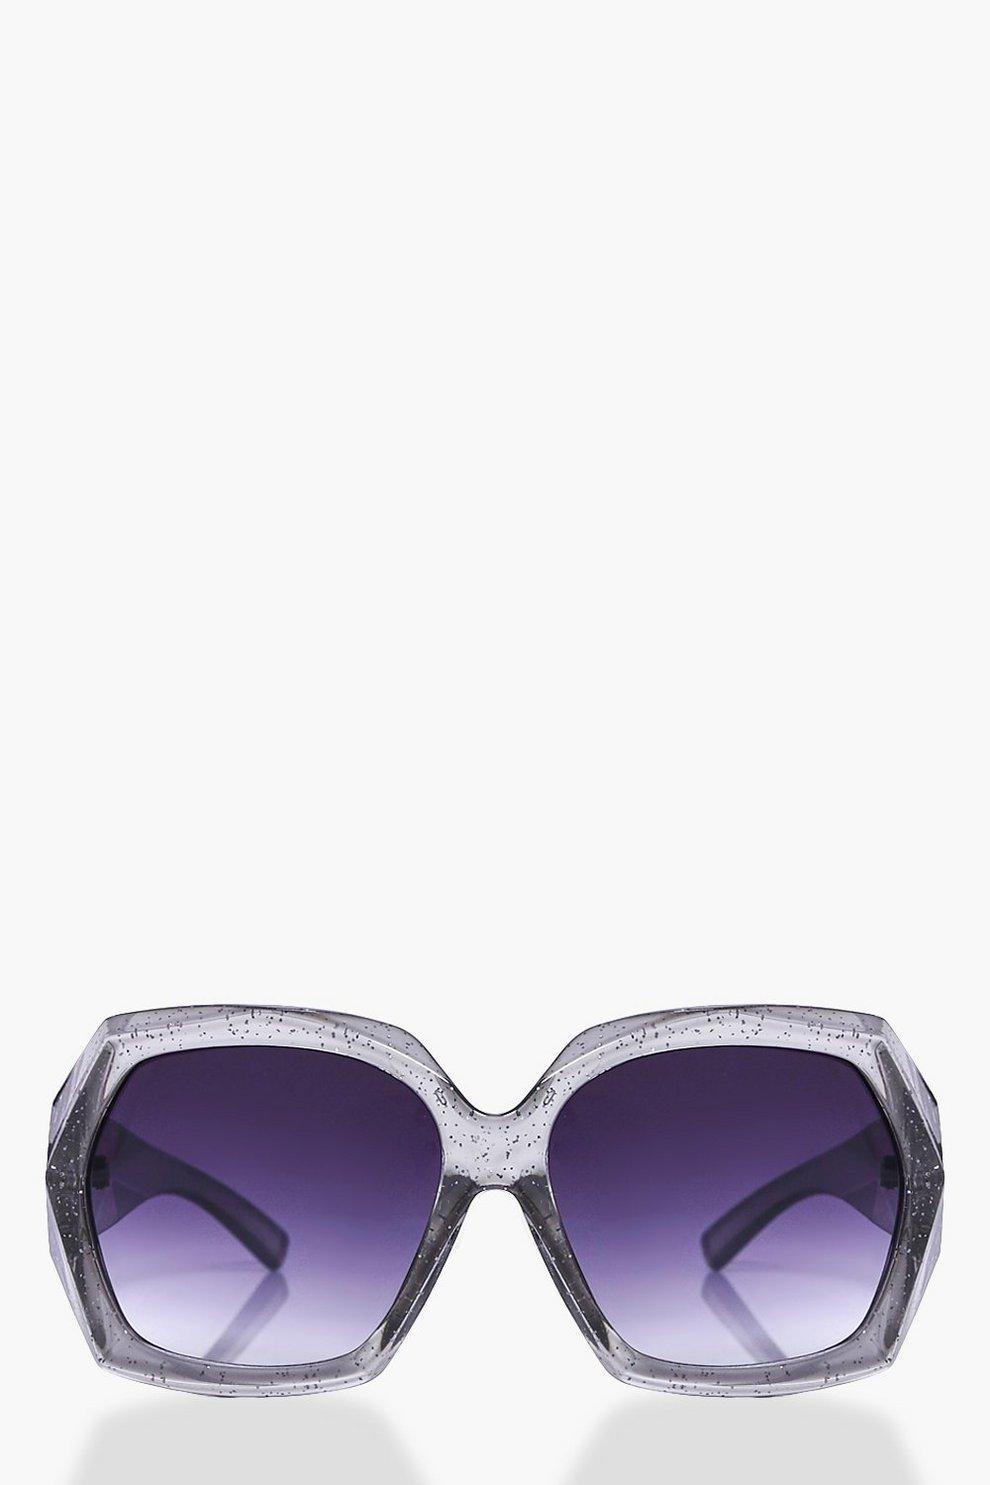 Maya Glitter Clear Frame Oversized Fashion Glasses | Boohoo